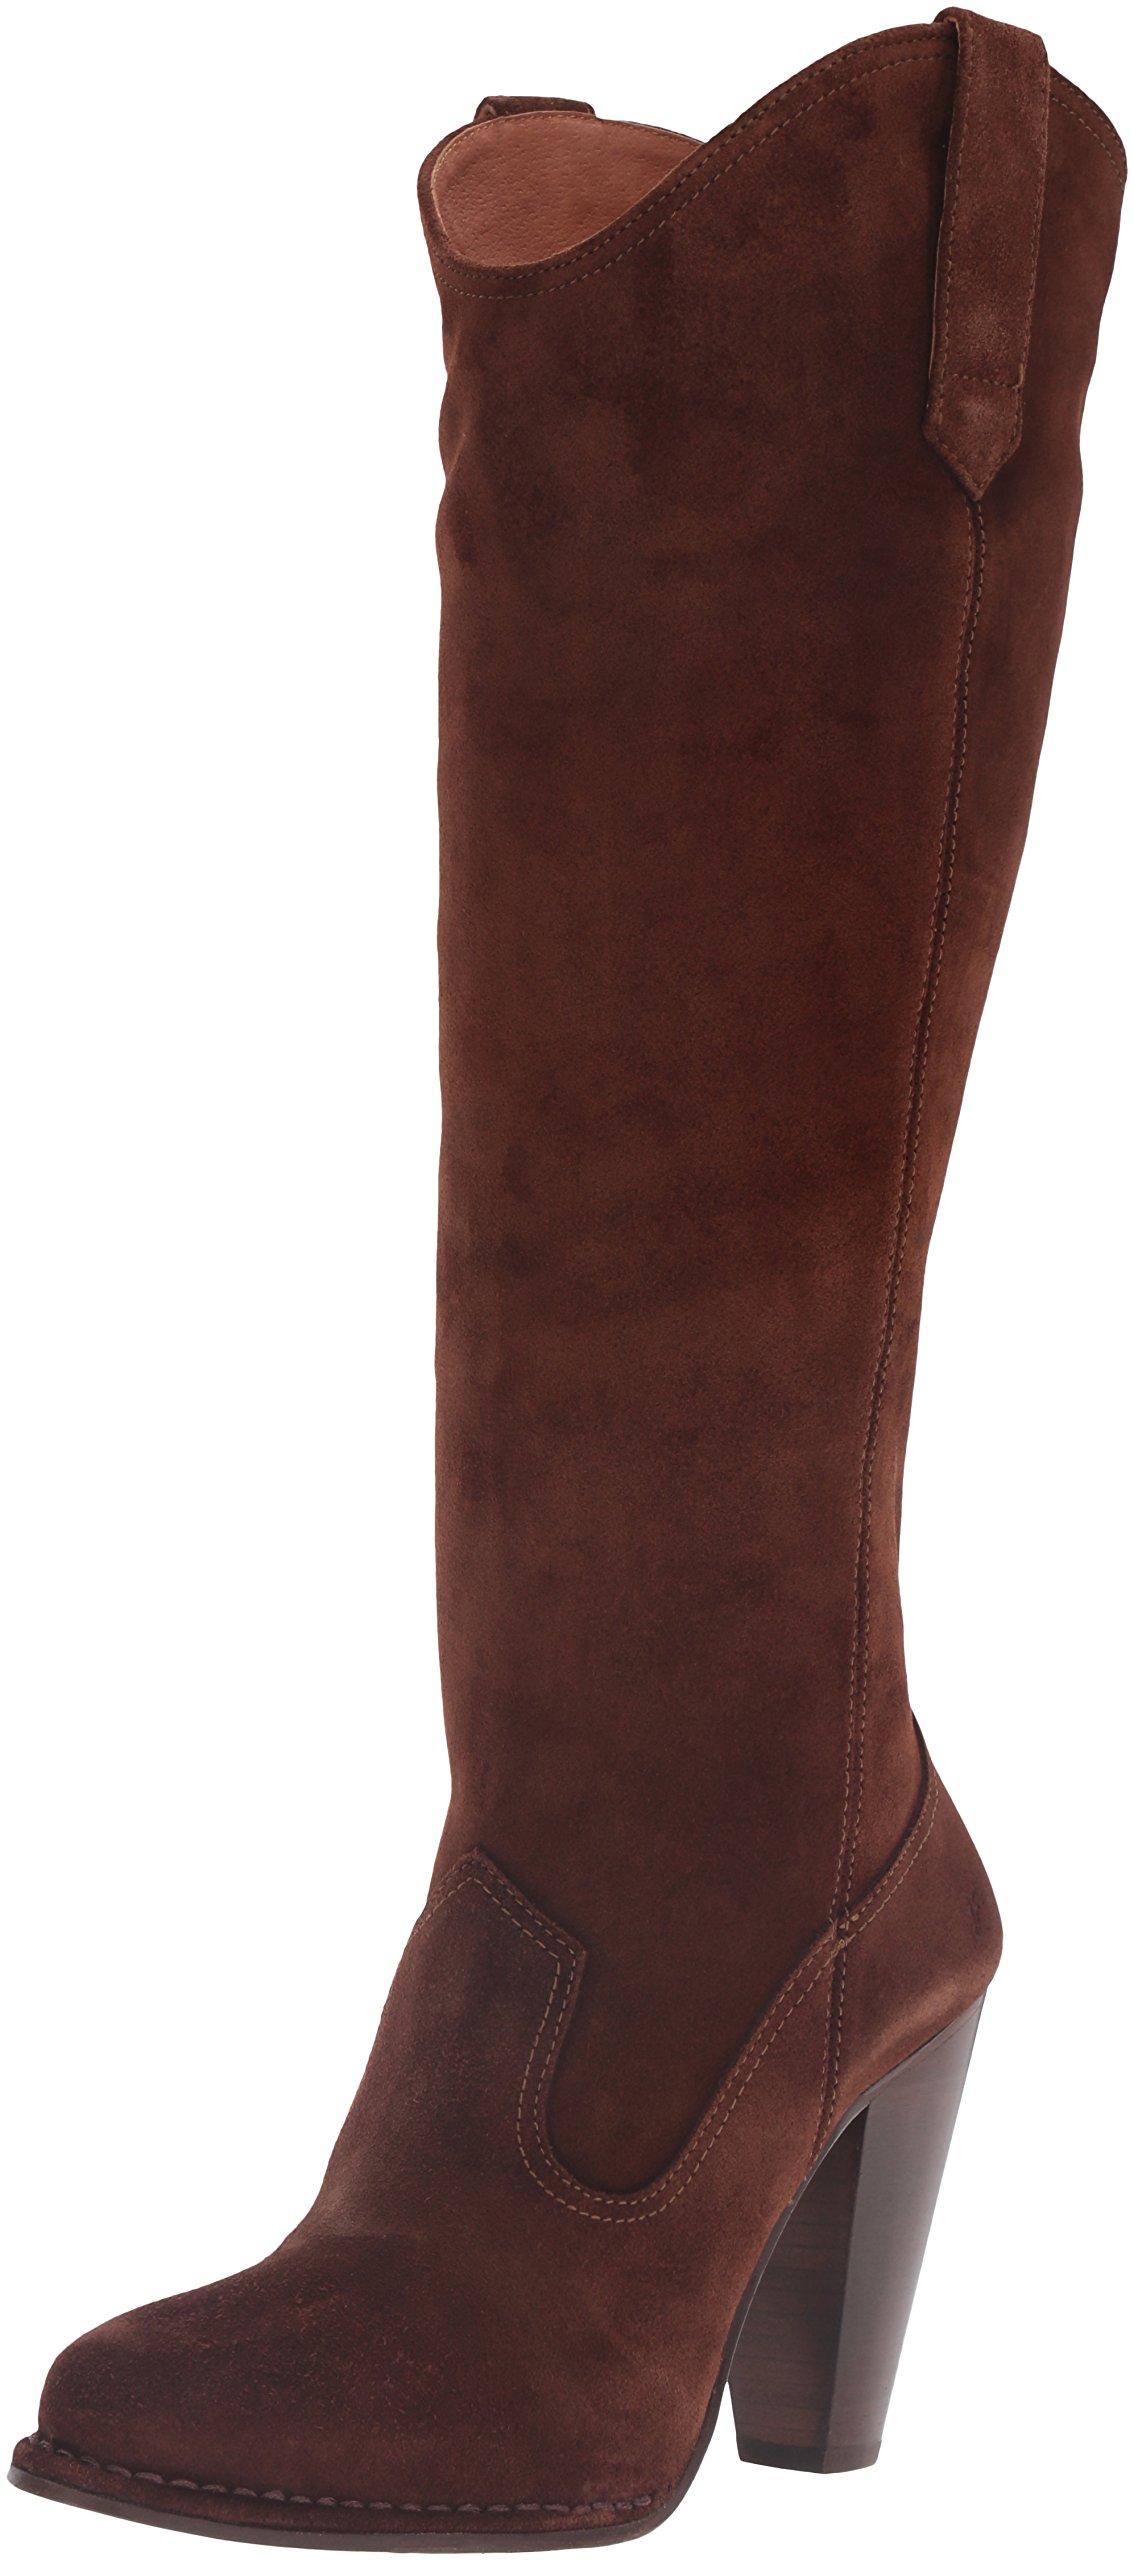 FRYE Women's Madeline Tall Western Boot, Brown, 8 M US